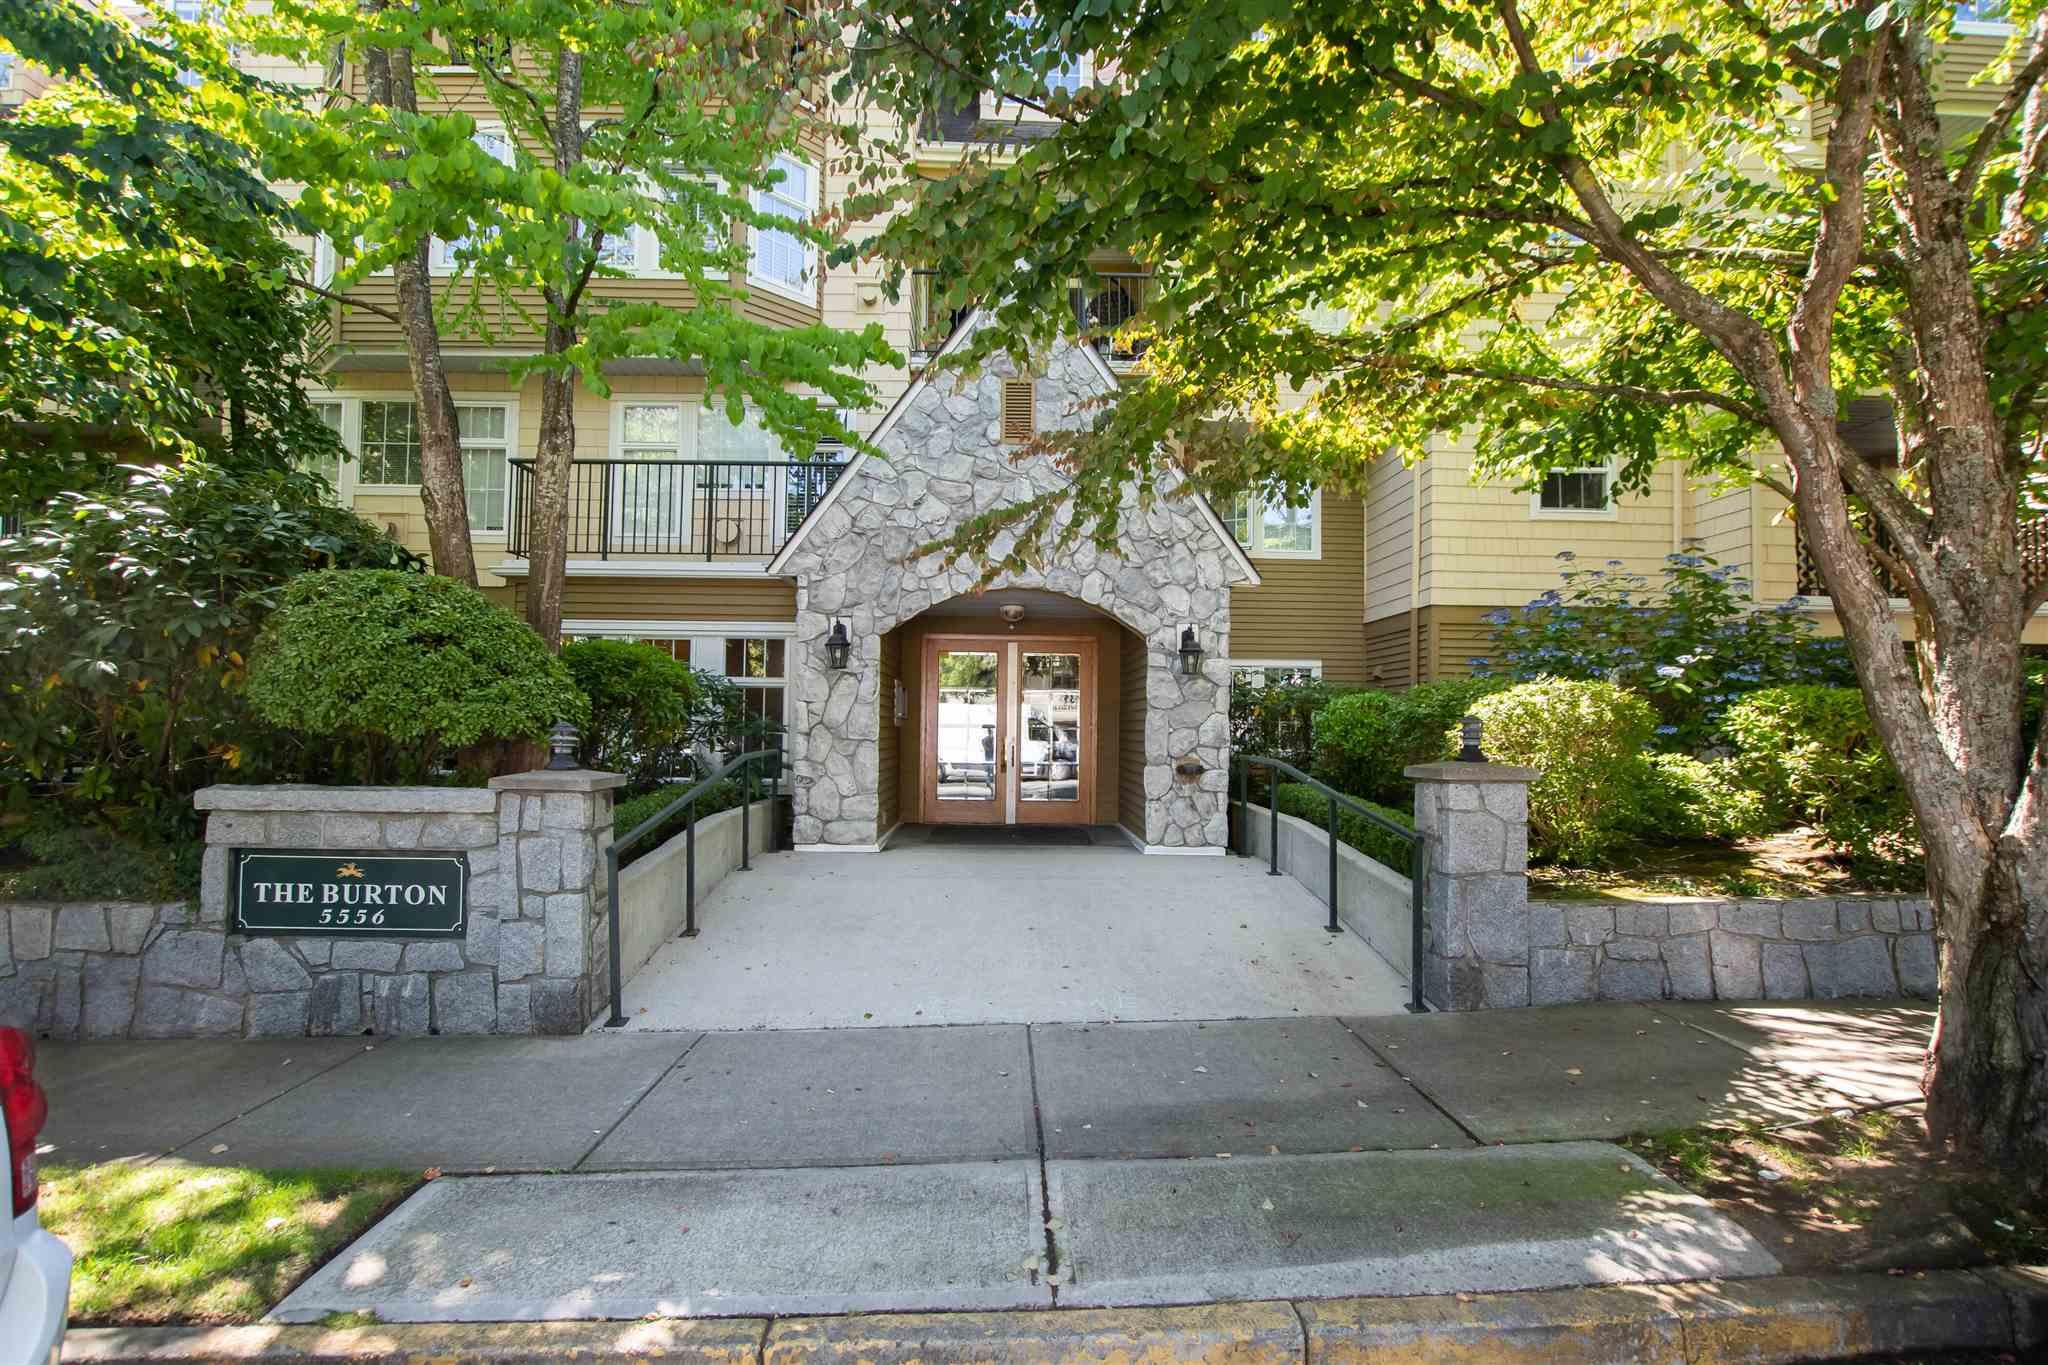 111 5556 14 AVENUE - Cliff Drive Apartment/Condo for sale, 2 Bedrooms (R2606258)